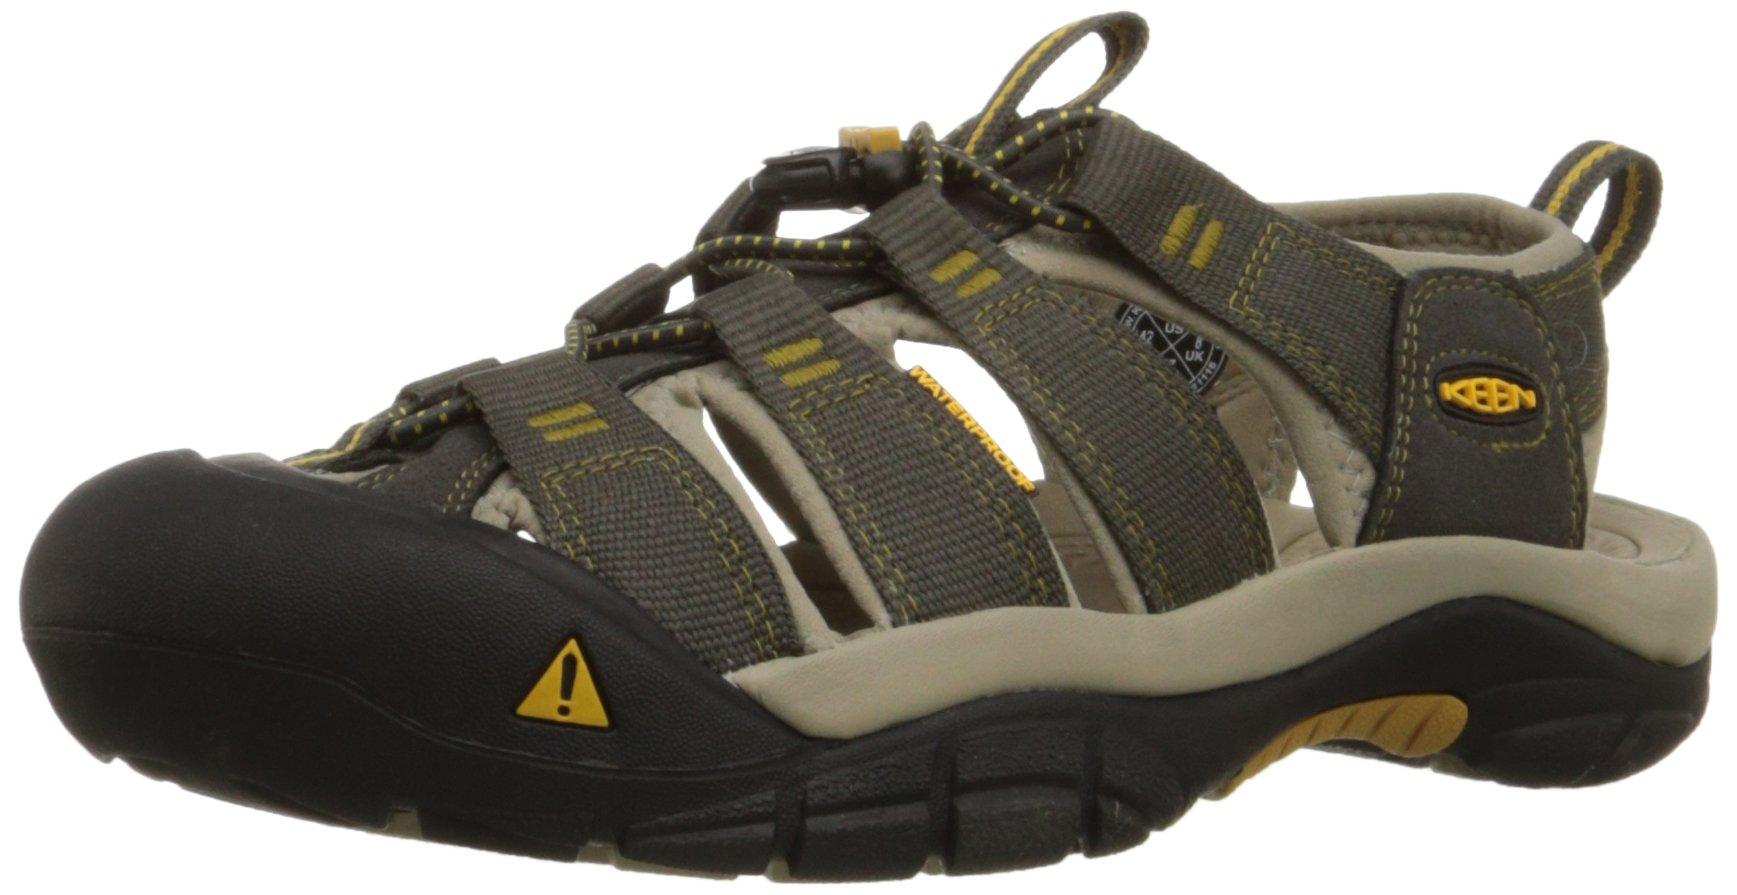 KEEN Men's Newport H2 Sandal, Raven/Aluminum, 9 M US